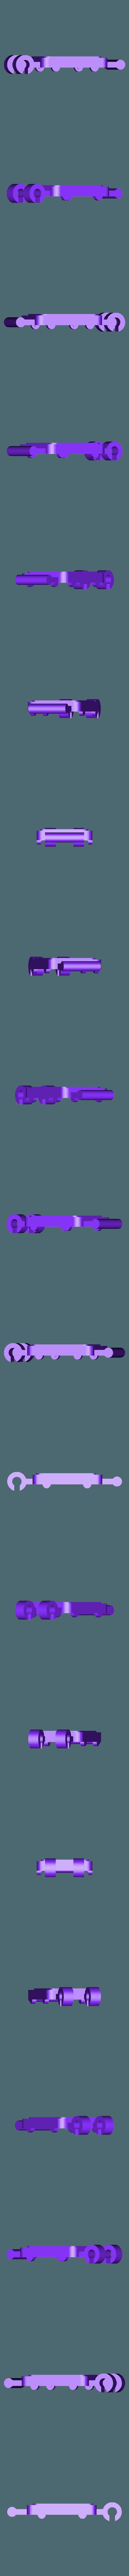 udeude.stl Download free STL file Momonga • 3D printable object, choimoni